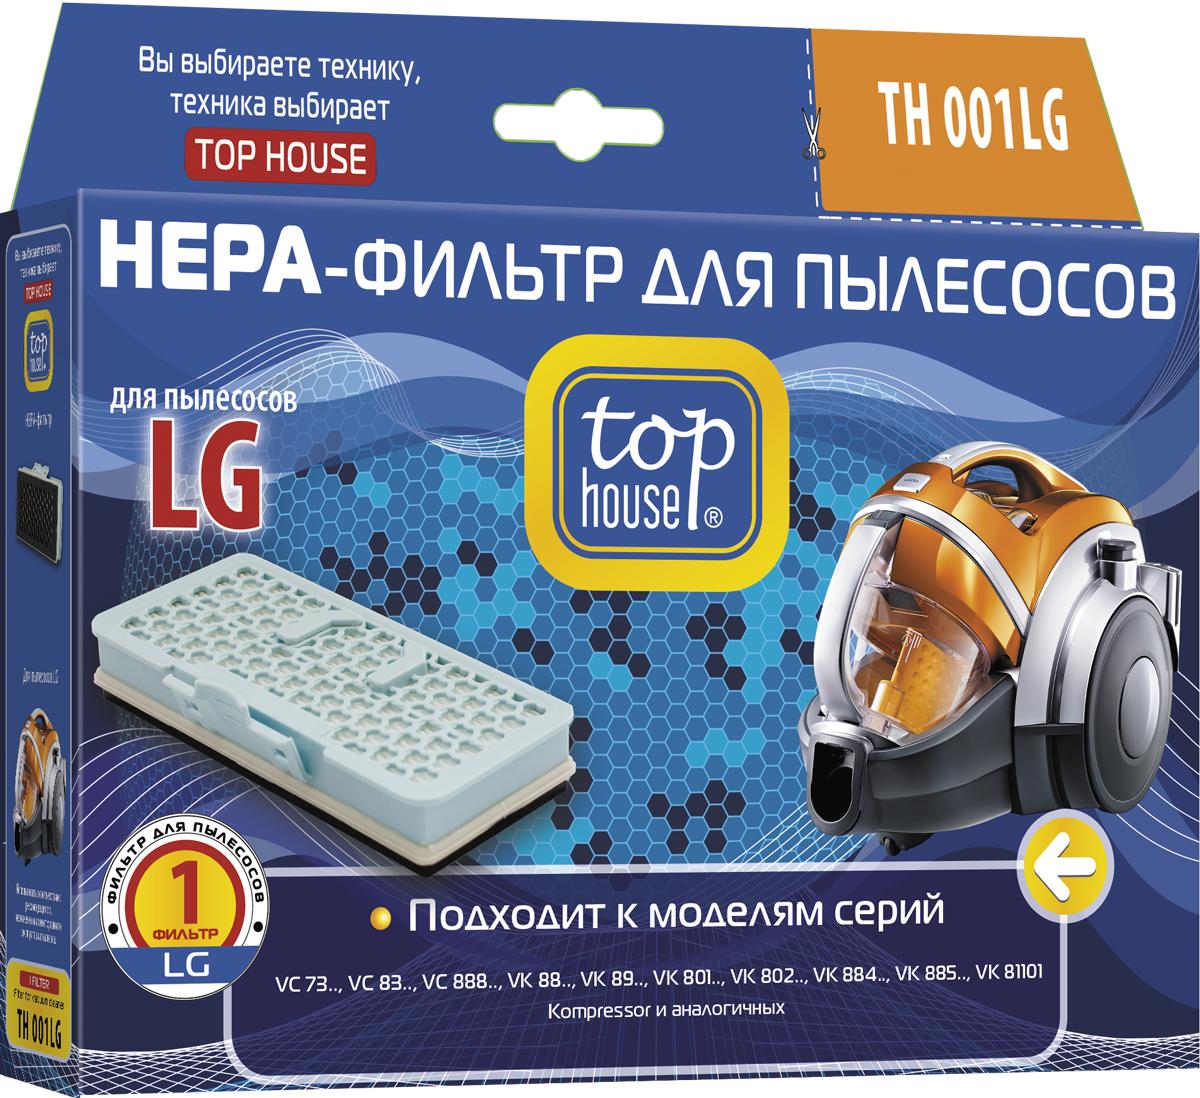 Top House TH 001LG HEPA-фильтр для пылесосов LG top house th 001lg hepa фильтр для пылесосов lg